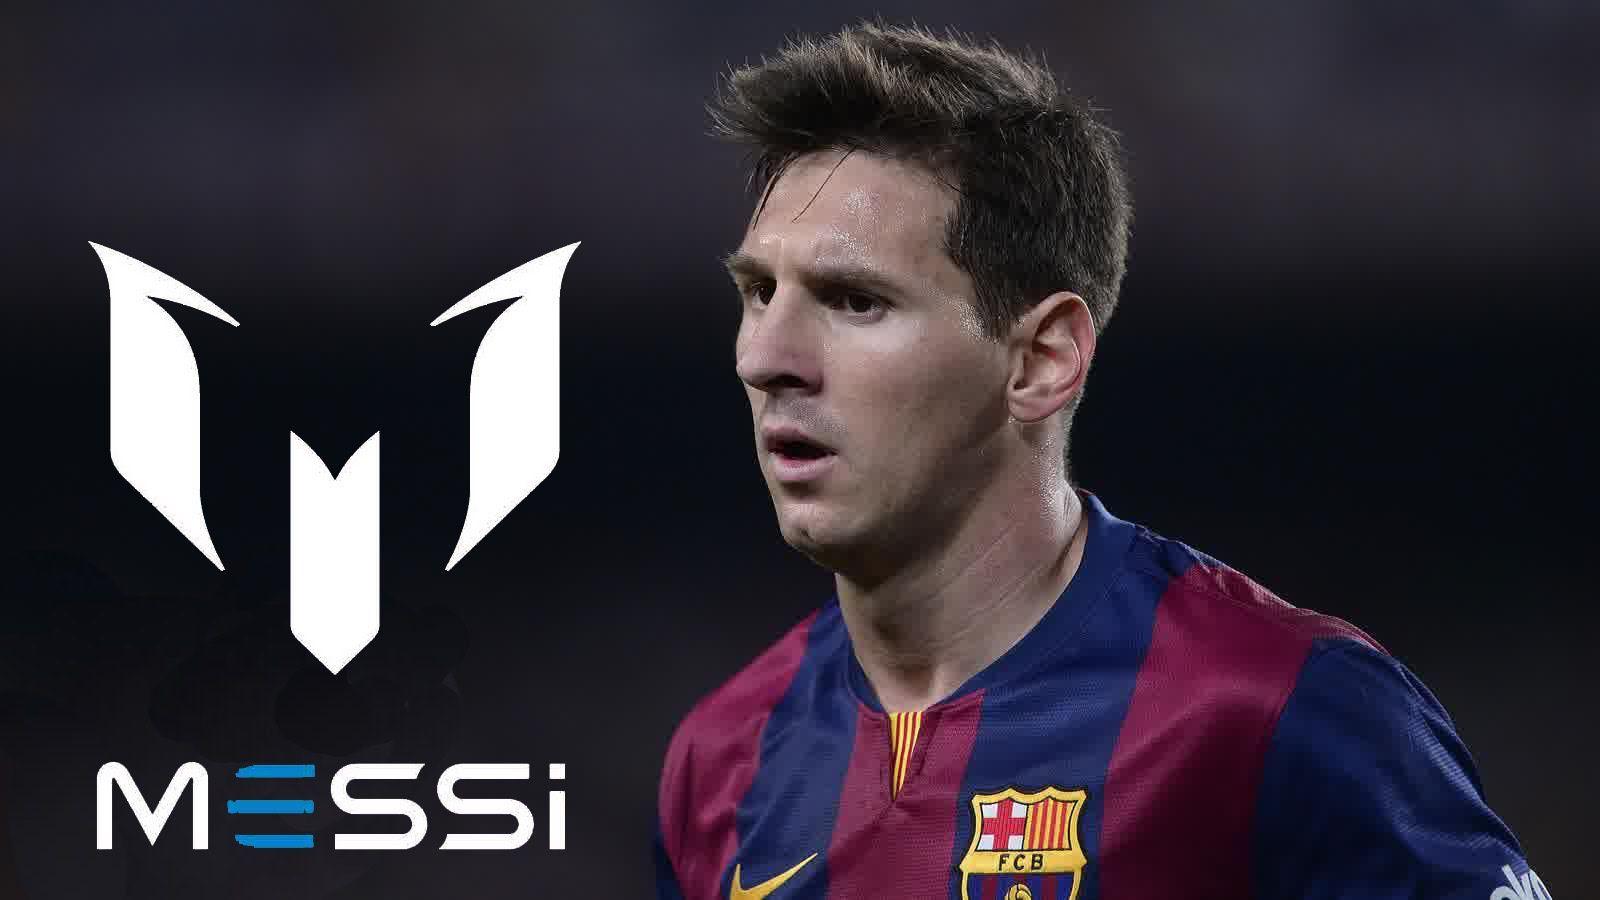 Messi Wallpaper Hd Best Wallpaper Hd Lionel Messi Wallpapers Lionel Messi Messi 2015